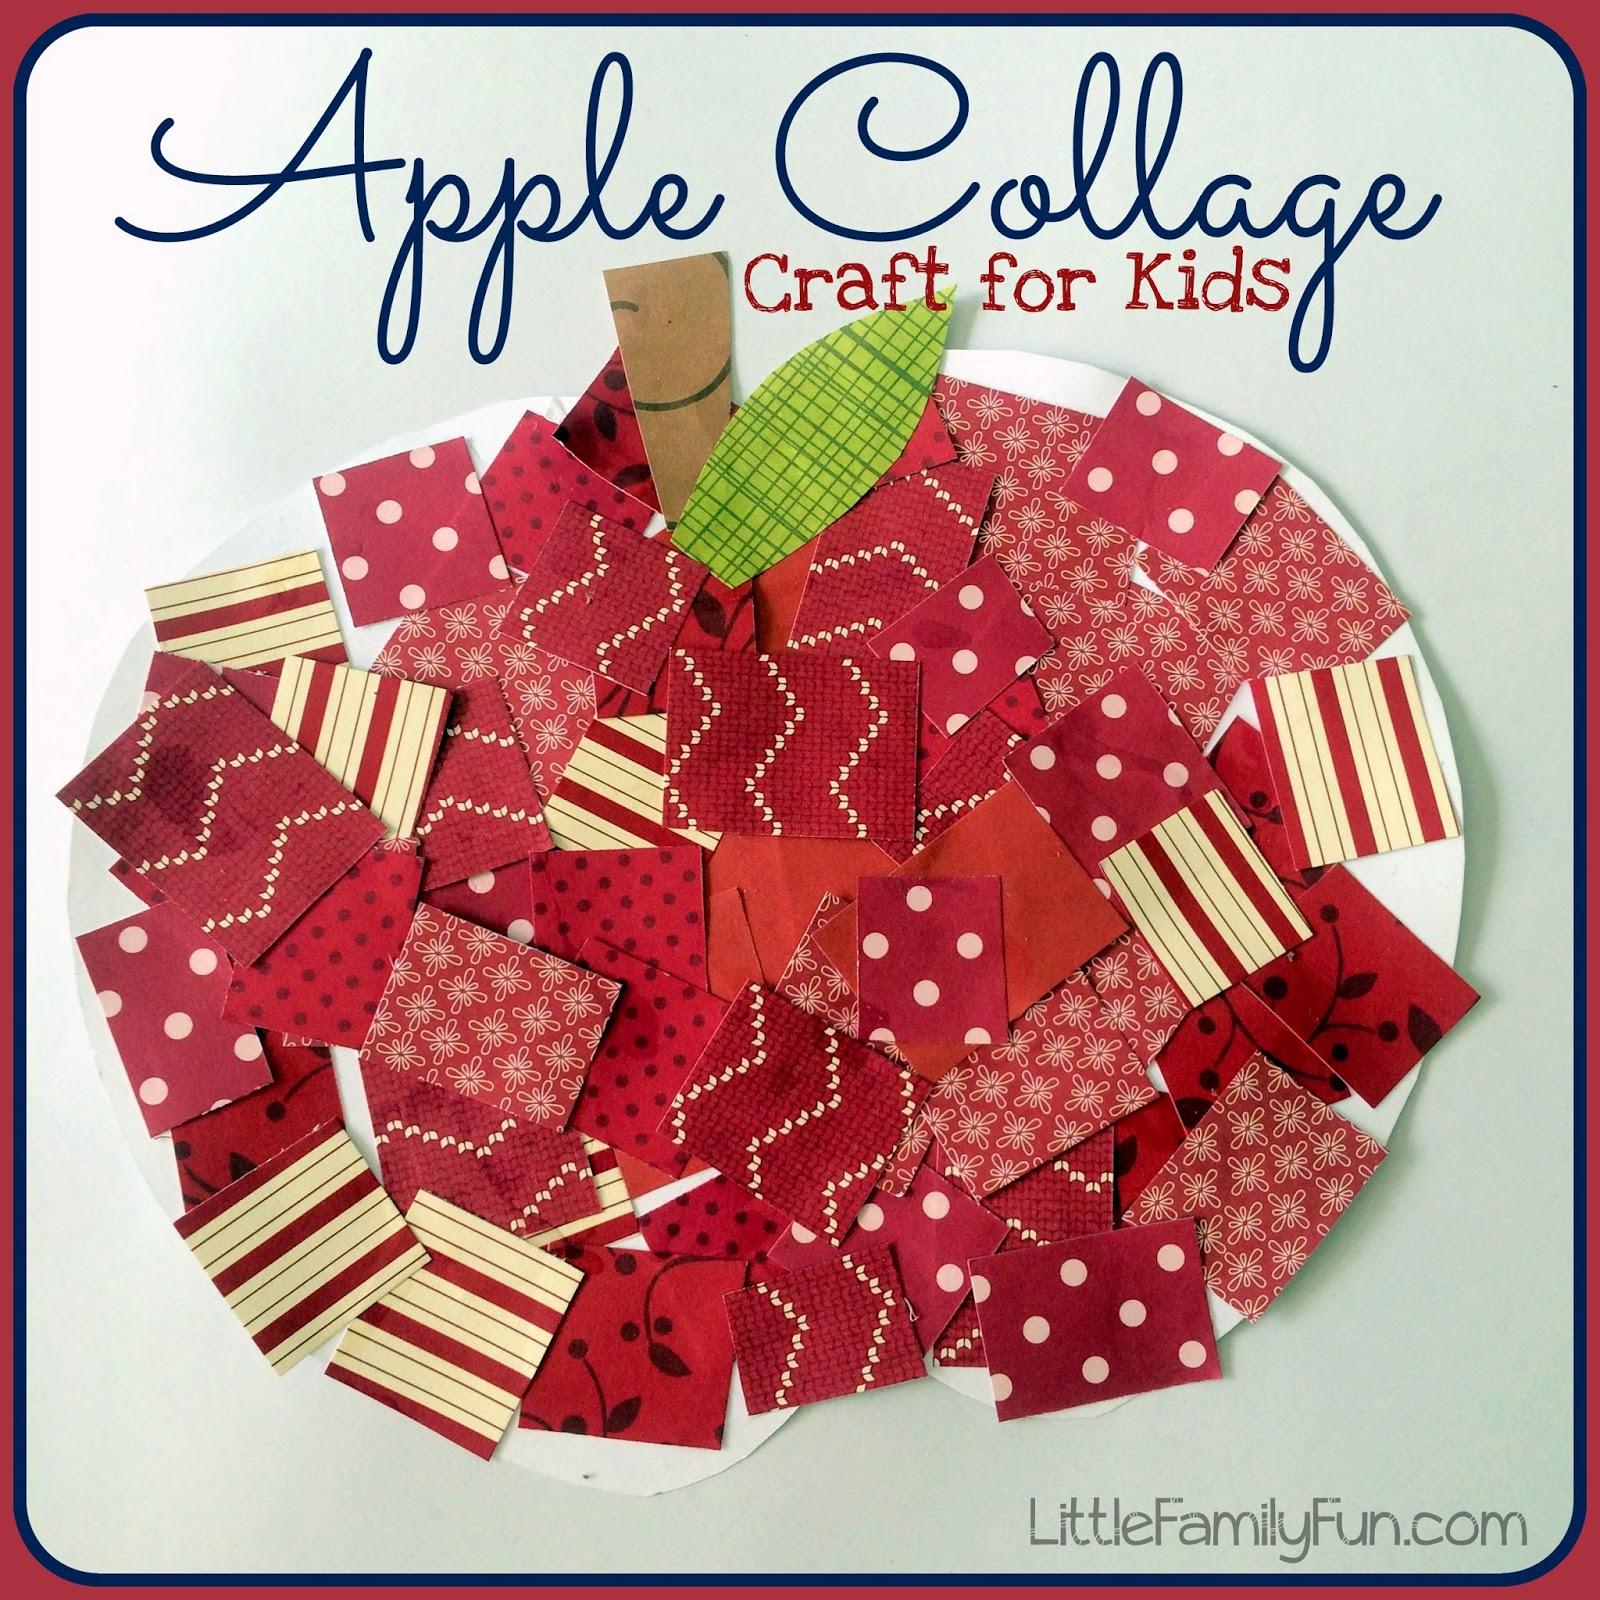 Little Family Fun: Apple Collage